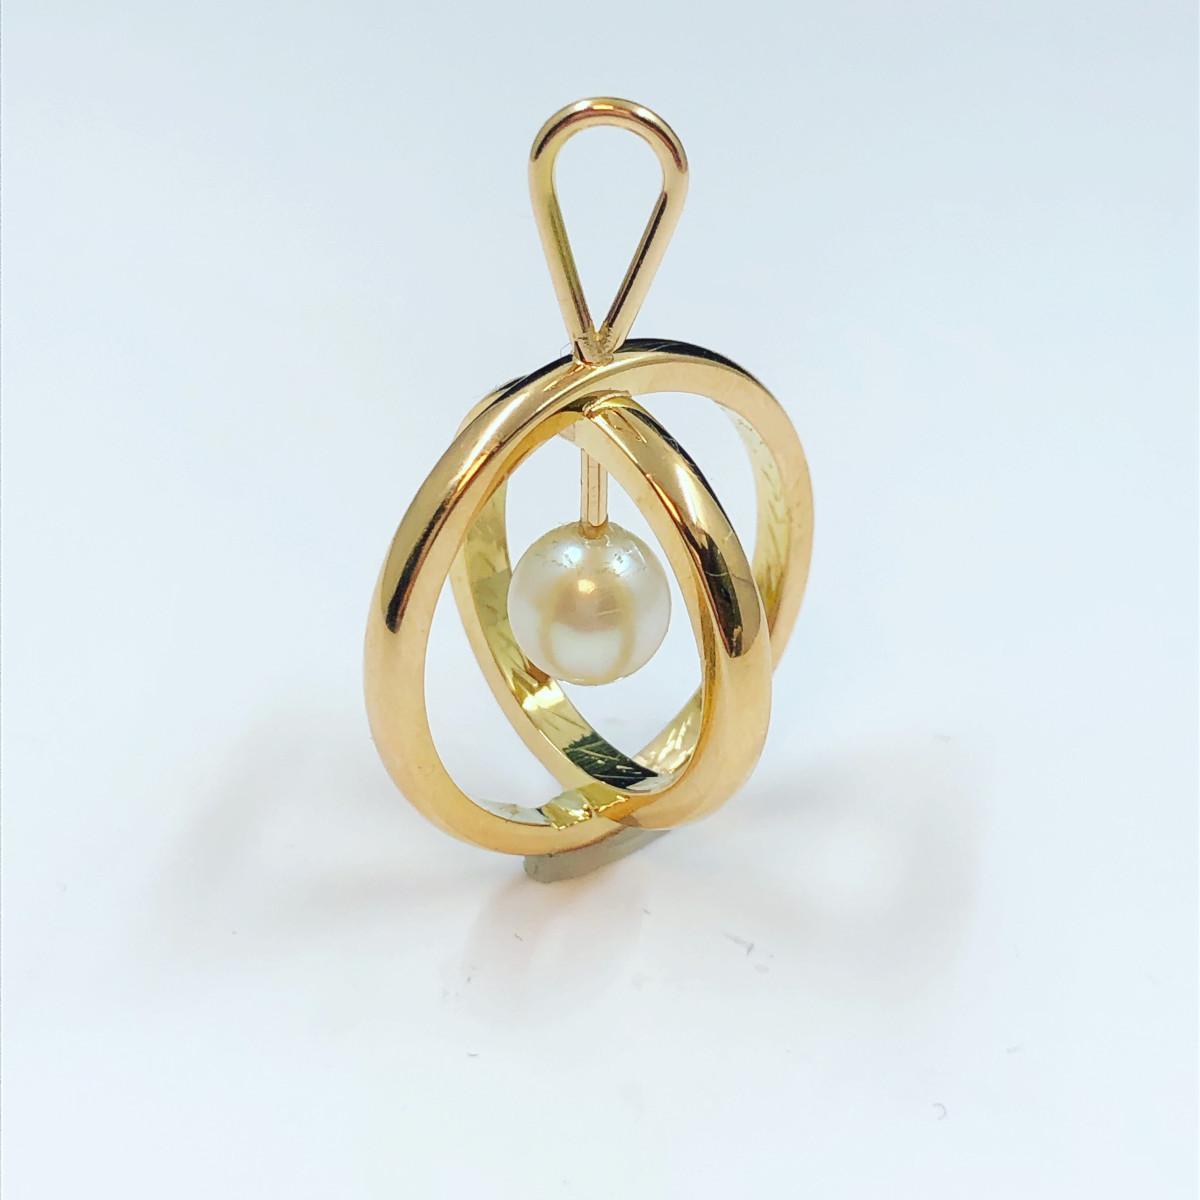 Guldhalsband, hängsmycke i guld, pärla